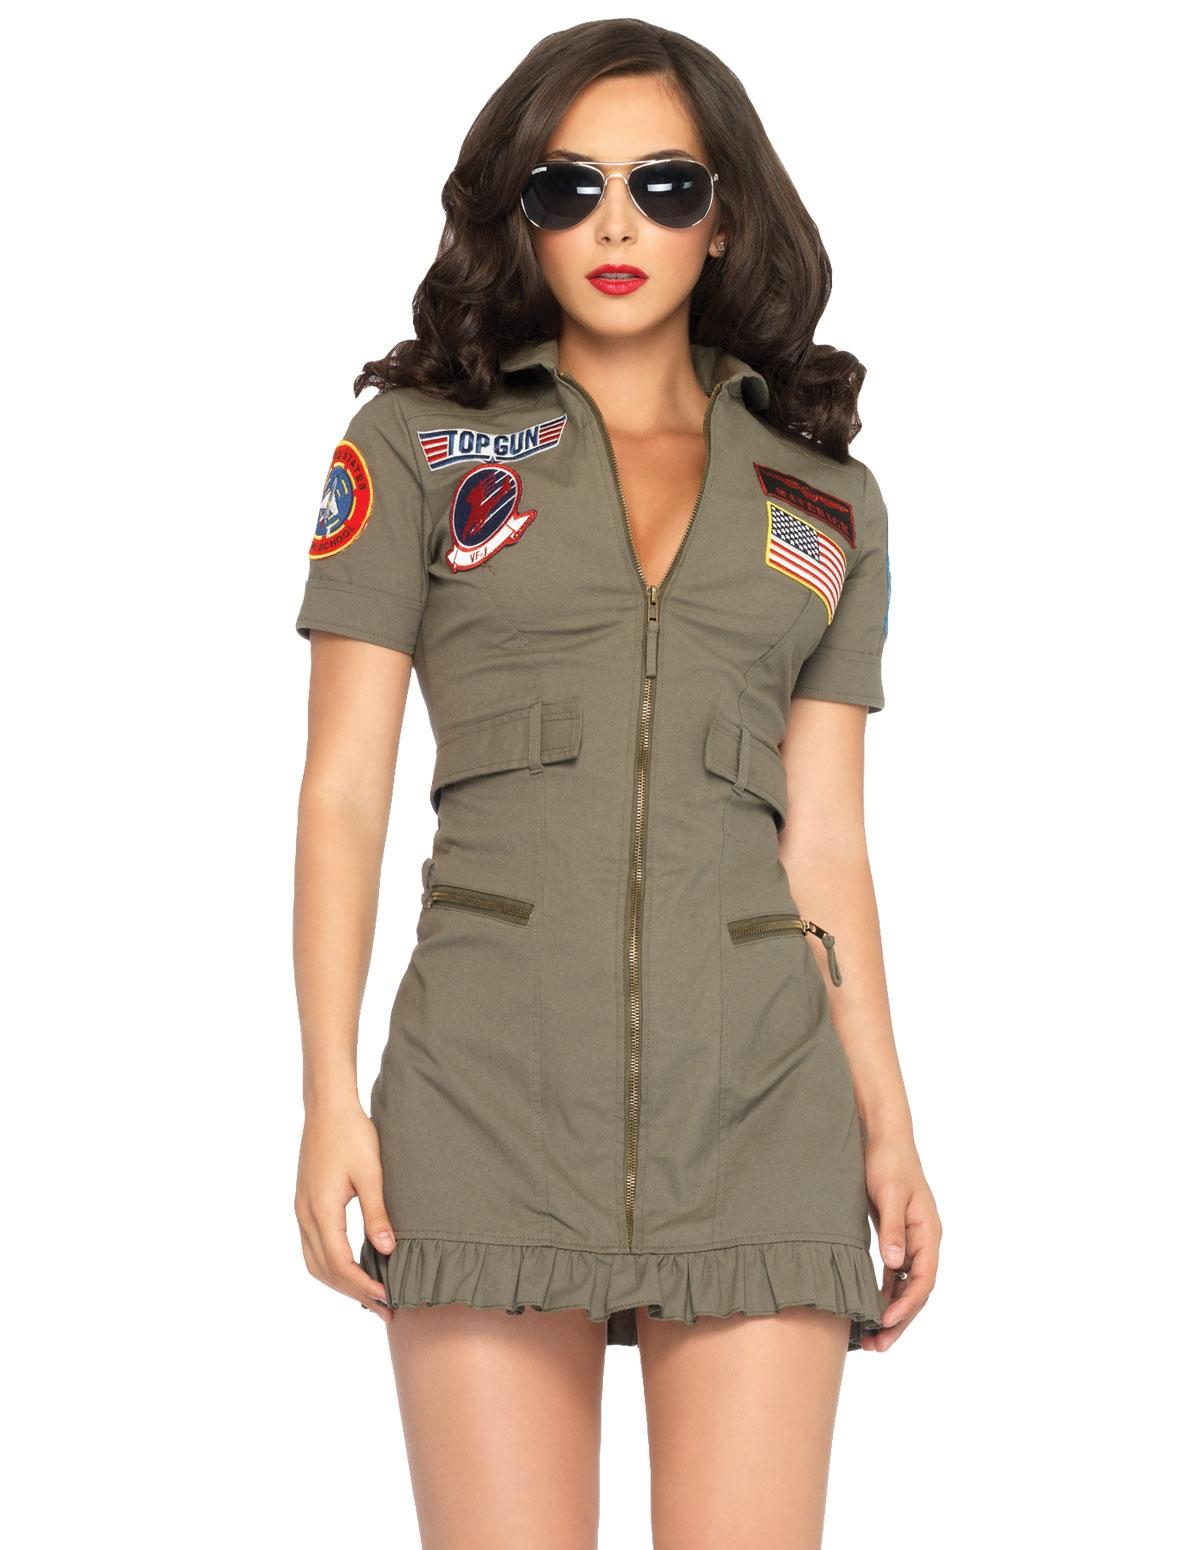 2Pc Top Gun Dress Costume